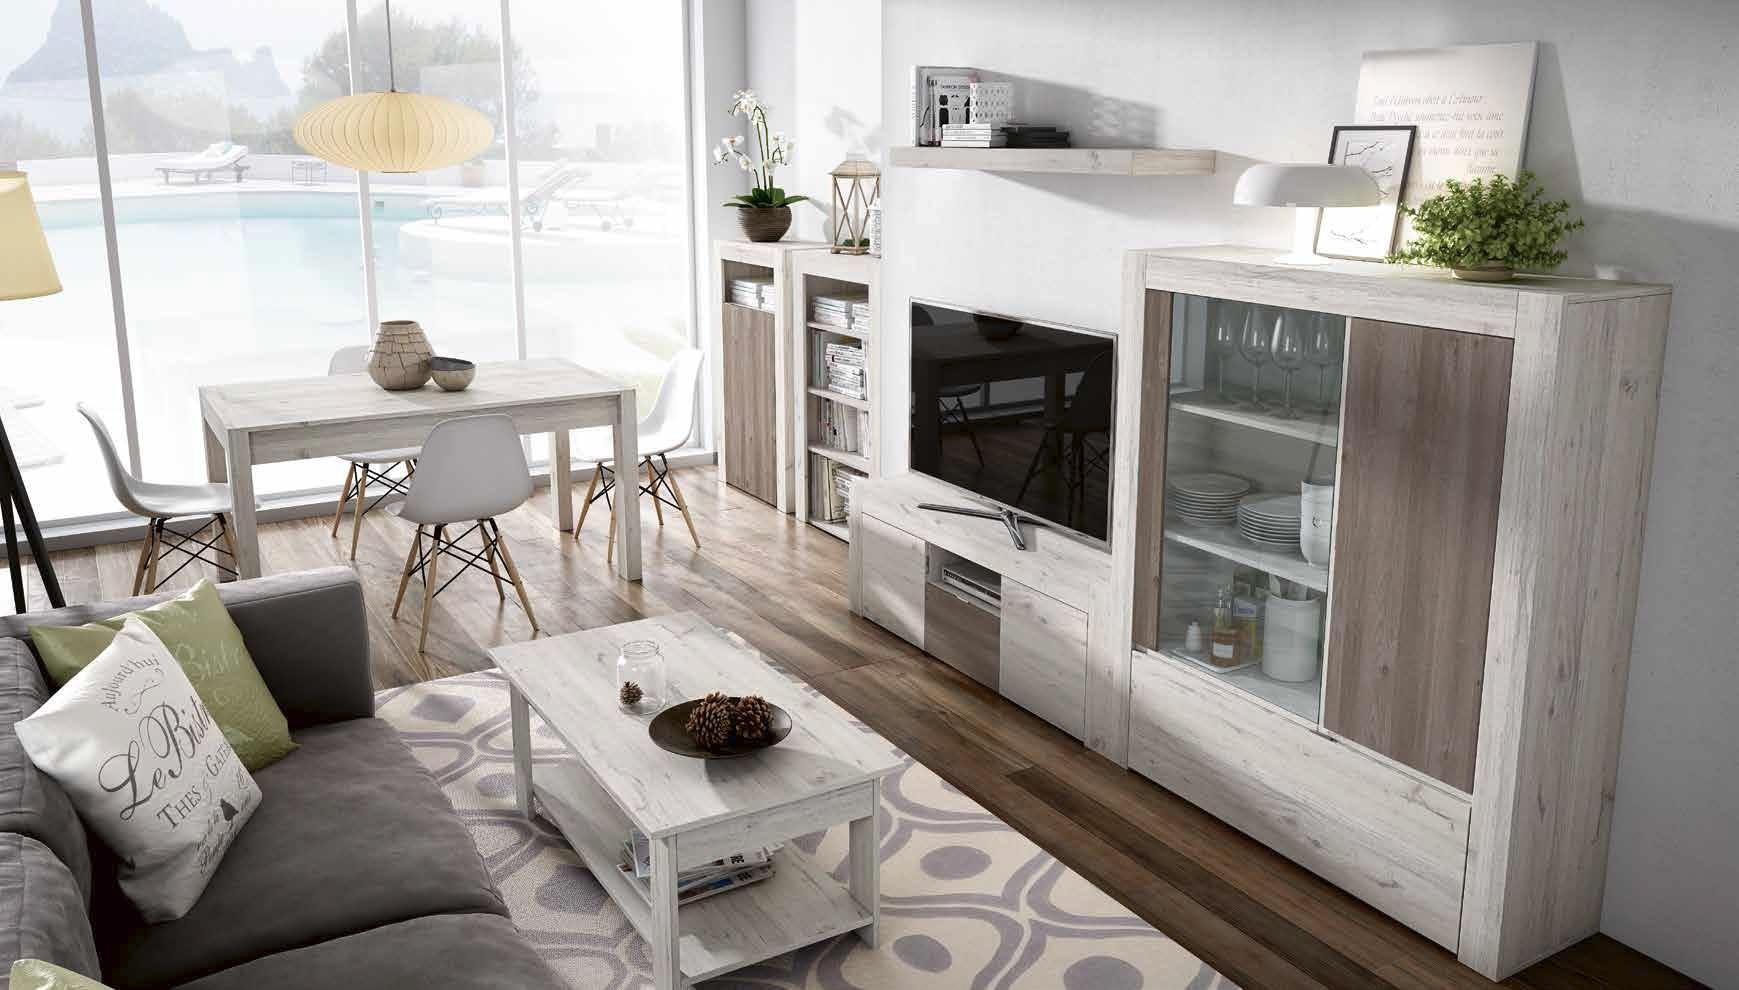 Tienda de muebles baratos online juveniles comedores for Comedores modernos